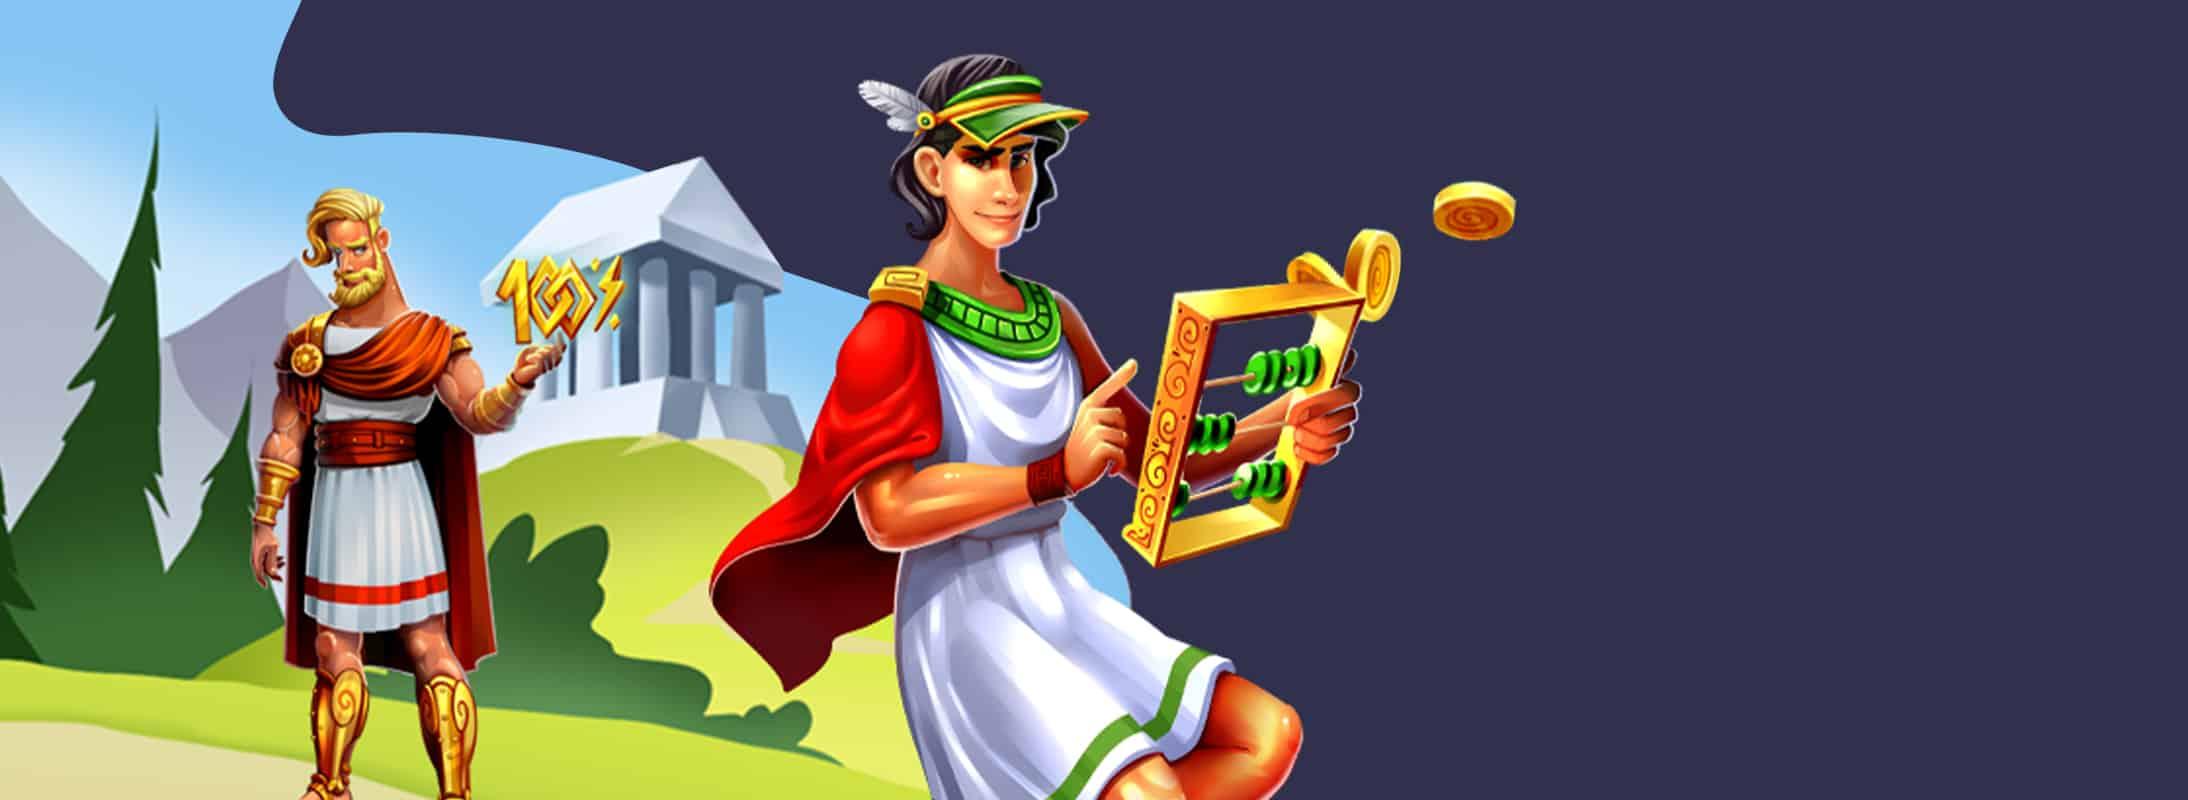 Genesis Global Limited utvides med helt nye Casino Gods - Norway CasinoTop Banner 01